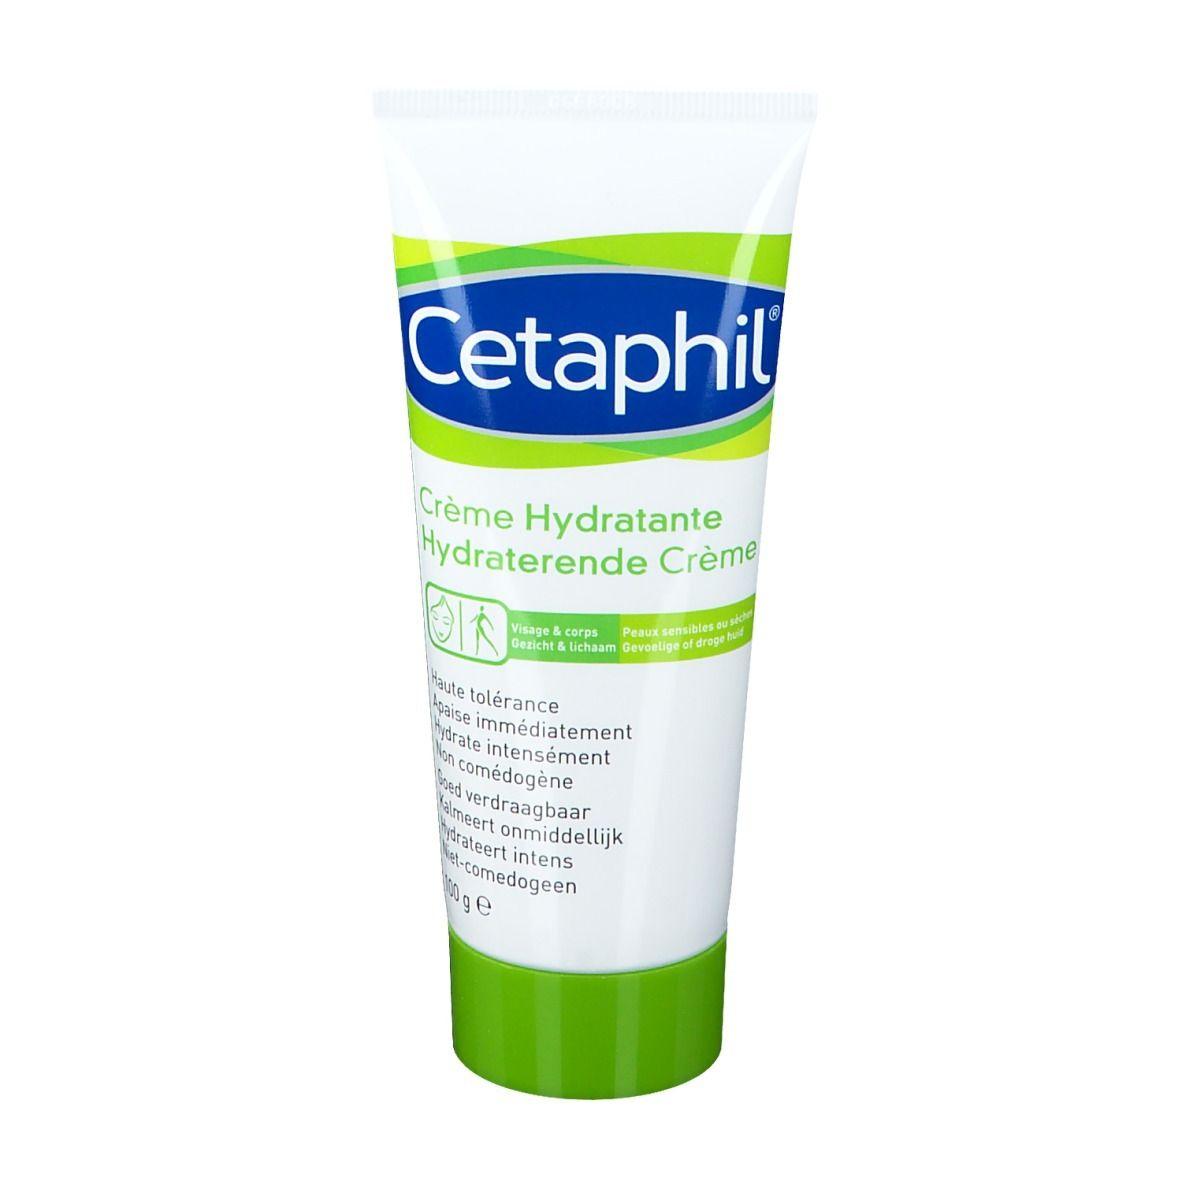 Cetaphil® Crème Hydratante